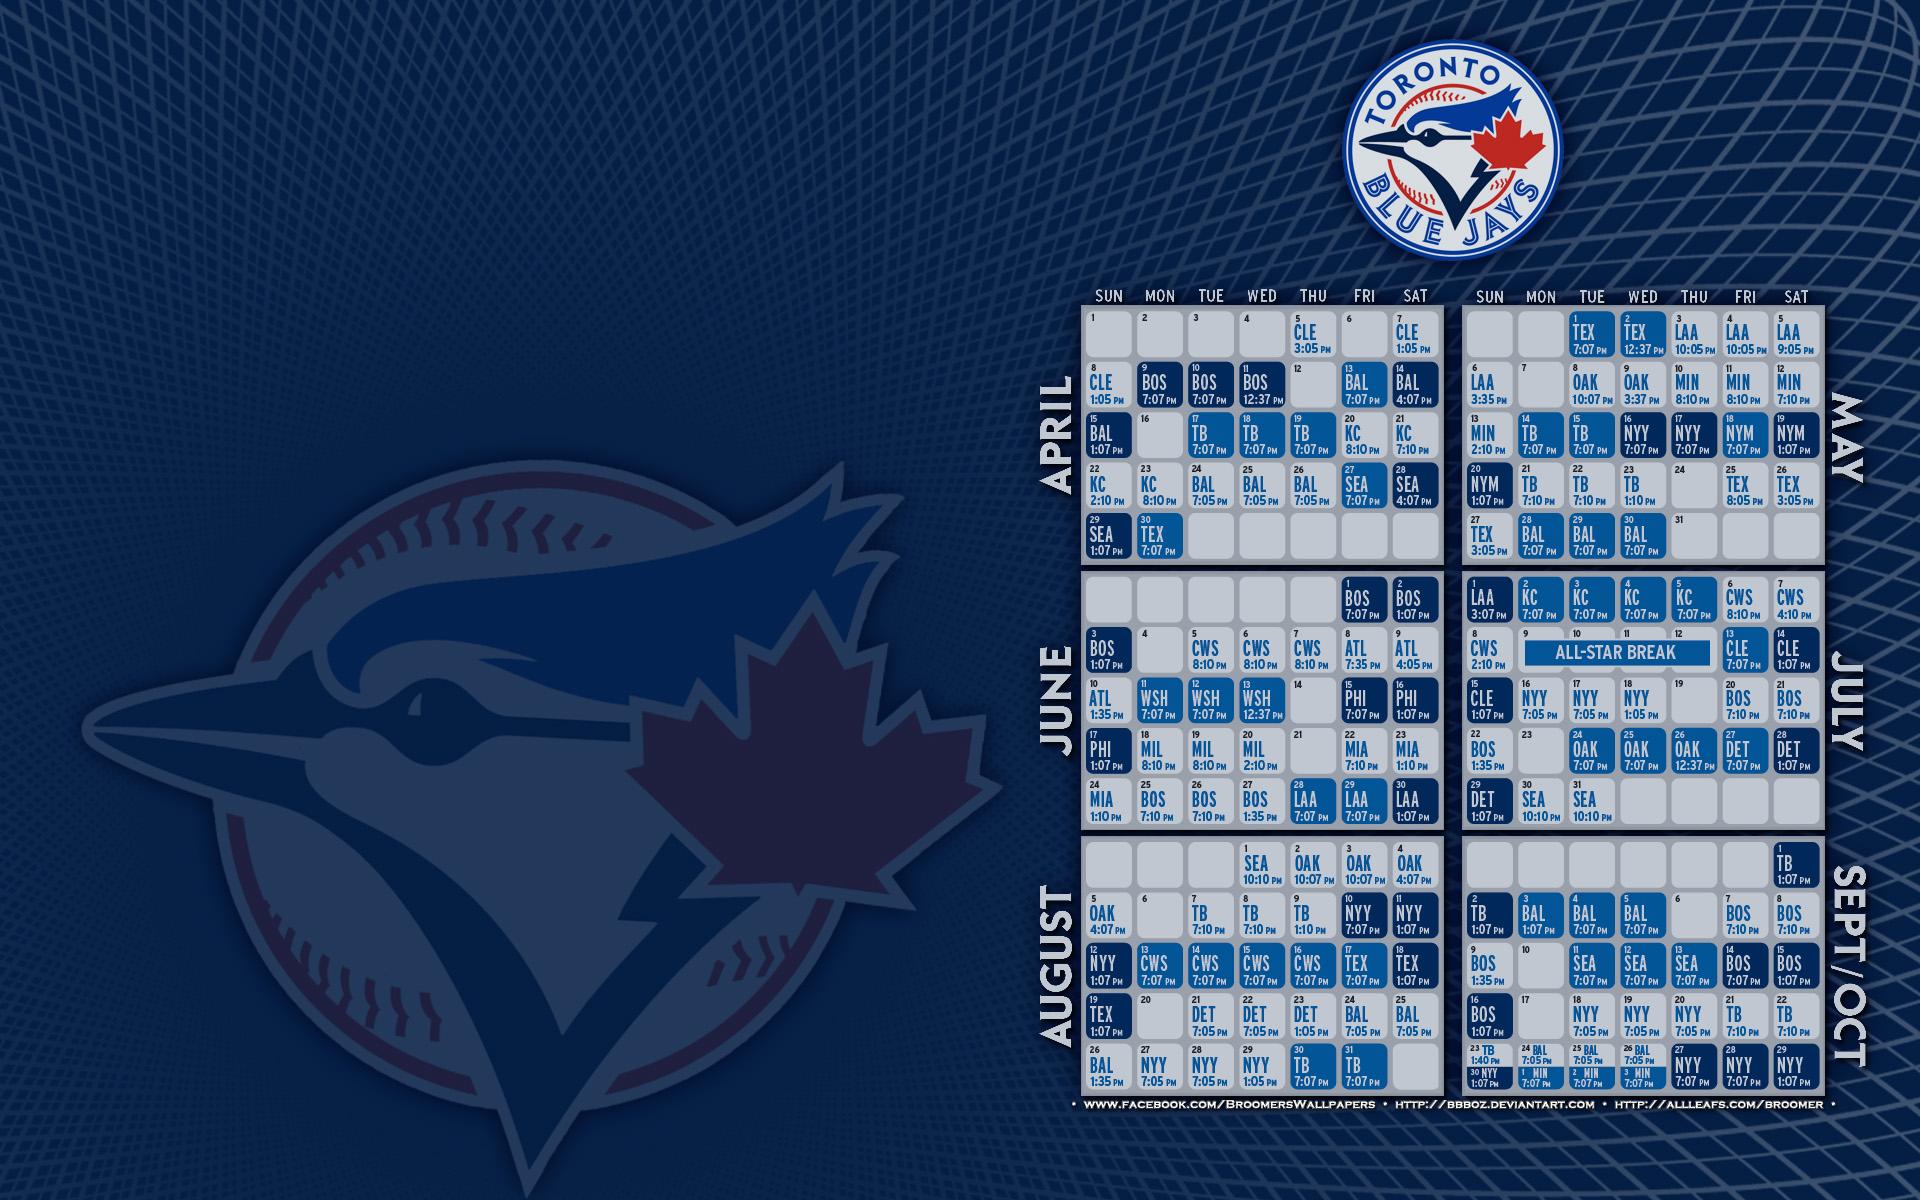 Free Download Toronto Blue Jays Logo Iphone Wallpaper Wallpapers